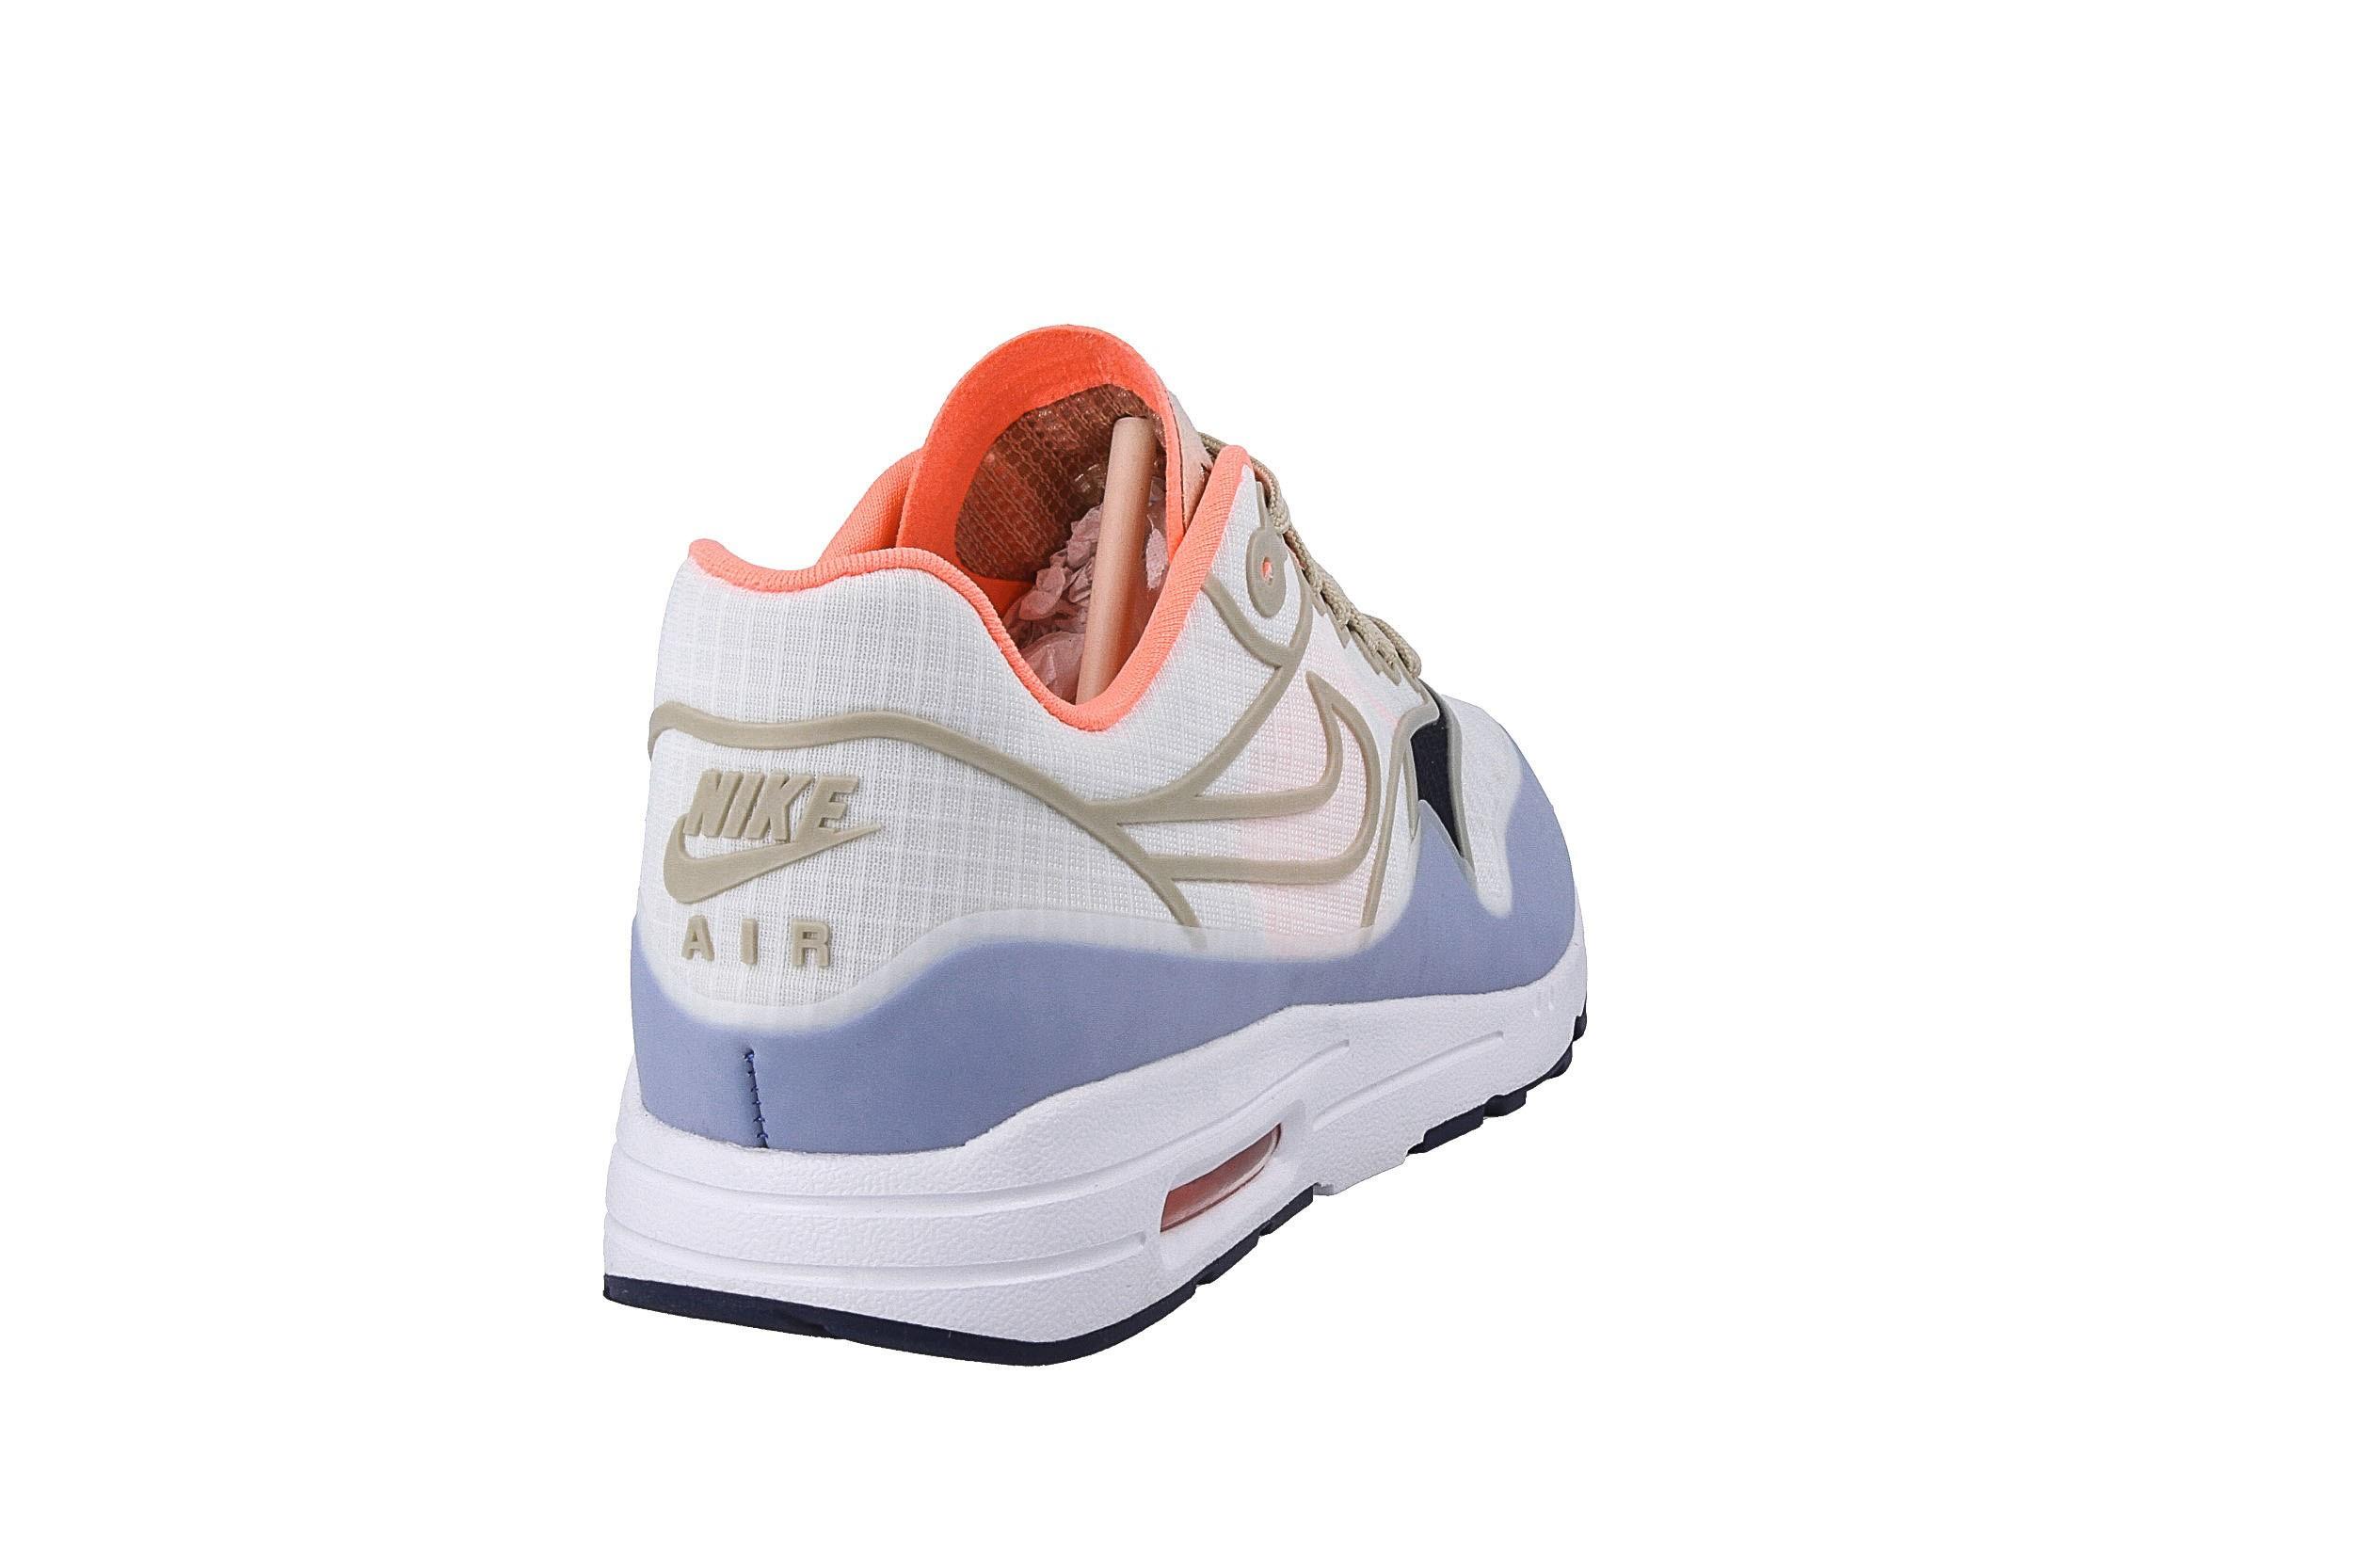 Nike Air Max 1 Ultra 2.0 Si 881103 102 SailOatmealWhiteLava Glow